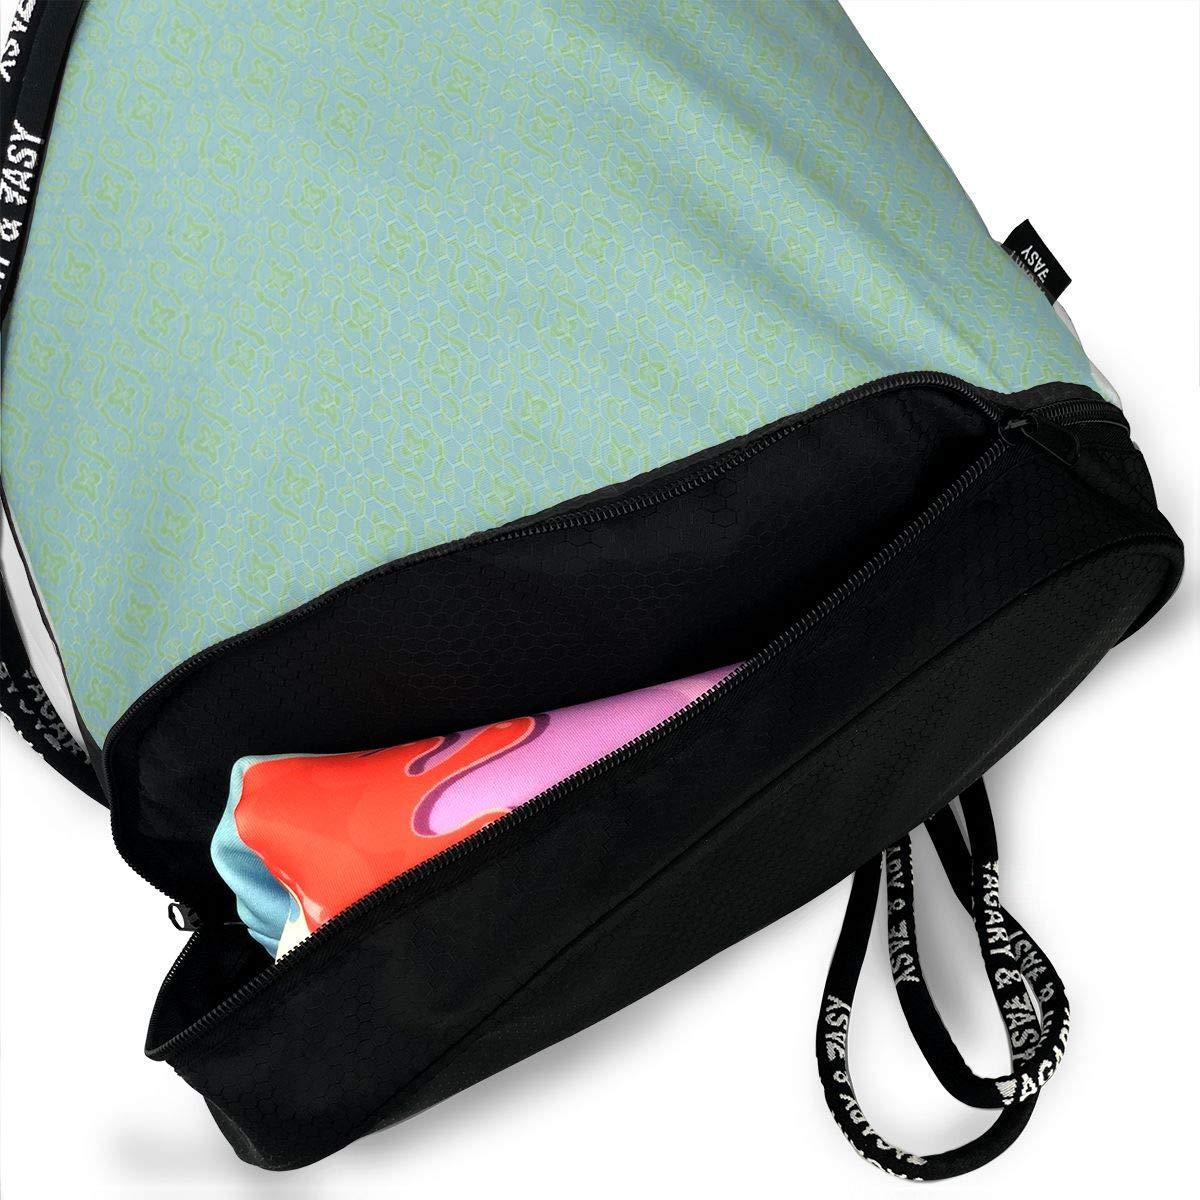 Baroque Lozenge Mermaid Drawstring Backpack Sports Athletic Gym Cinch Sack String Storage Bags for Hiking Travel Beach